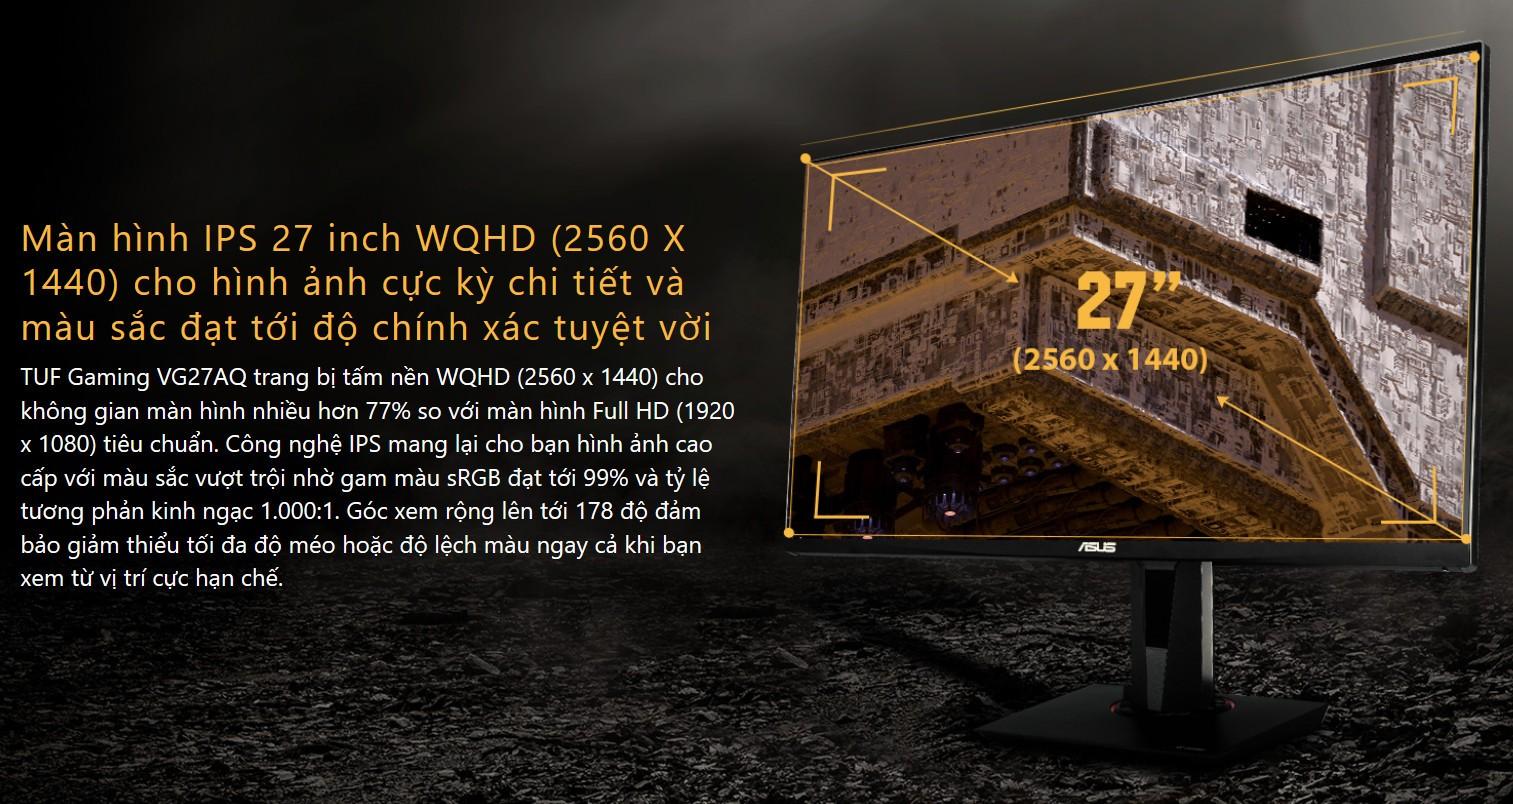 IPS 27-inch WQHD